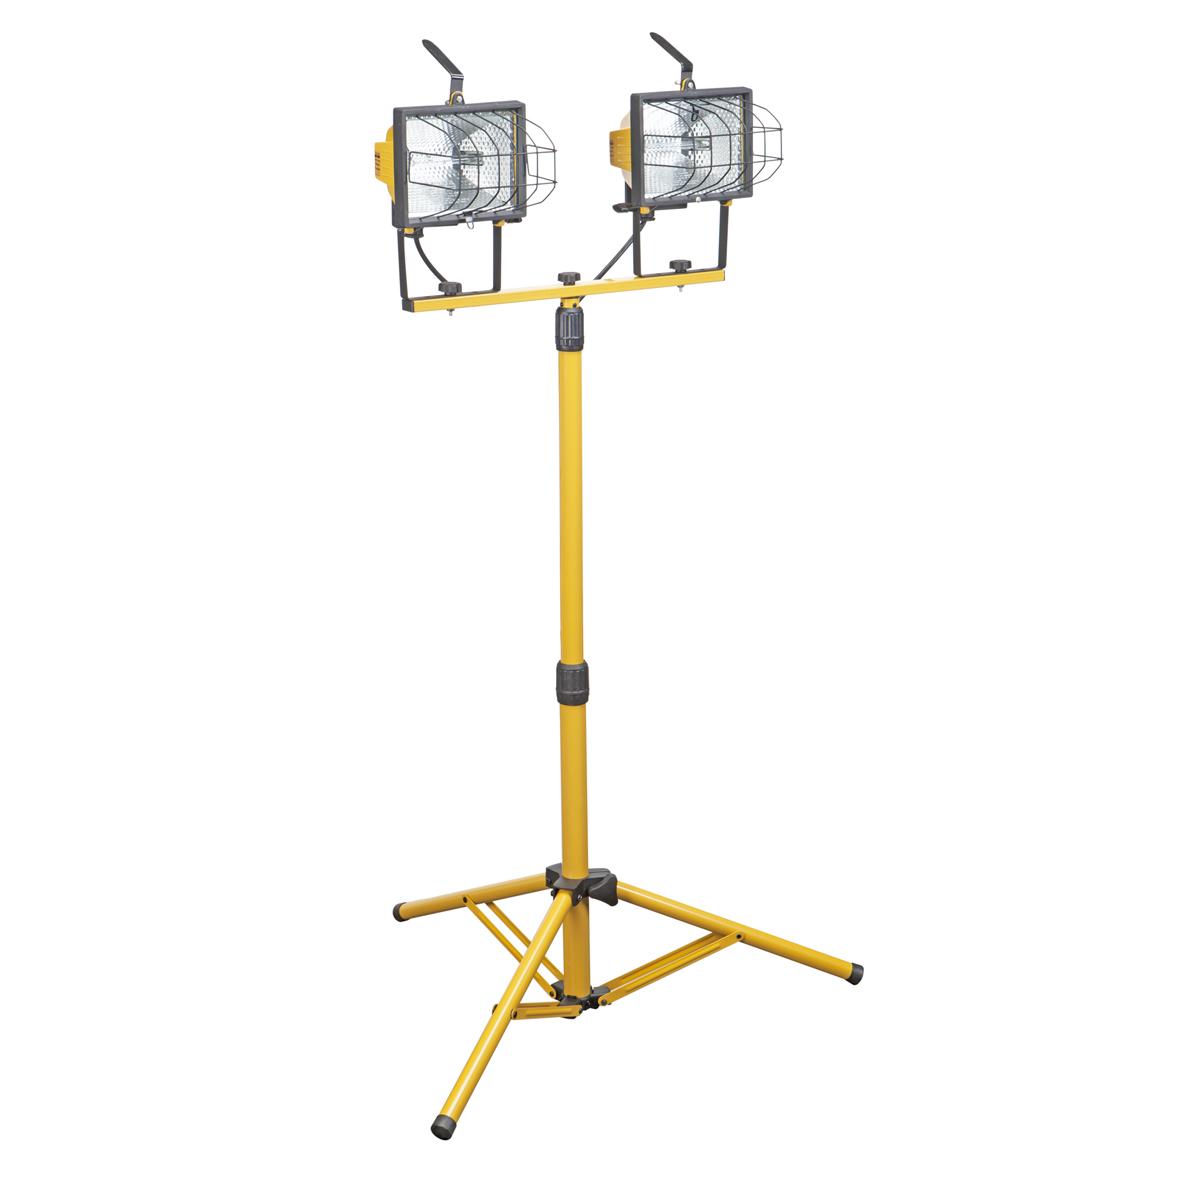 1000 Watt Twin Lamp Halogen Floodlight